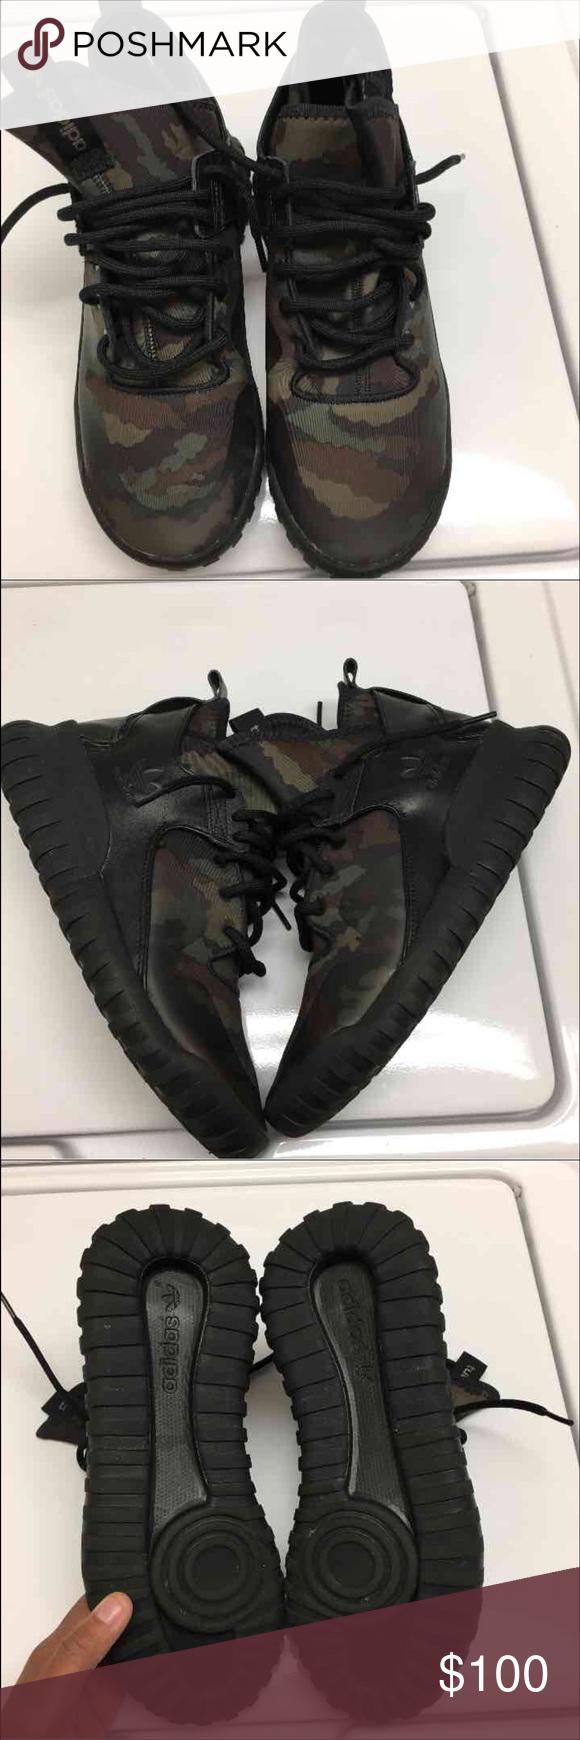 ⏳MENS adidas tubular sneakers RarE Army